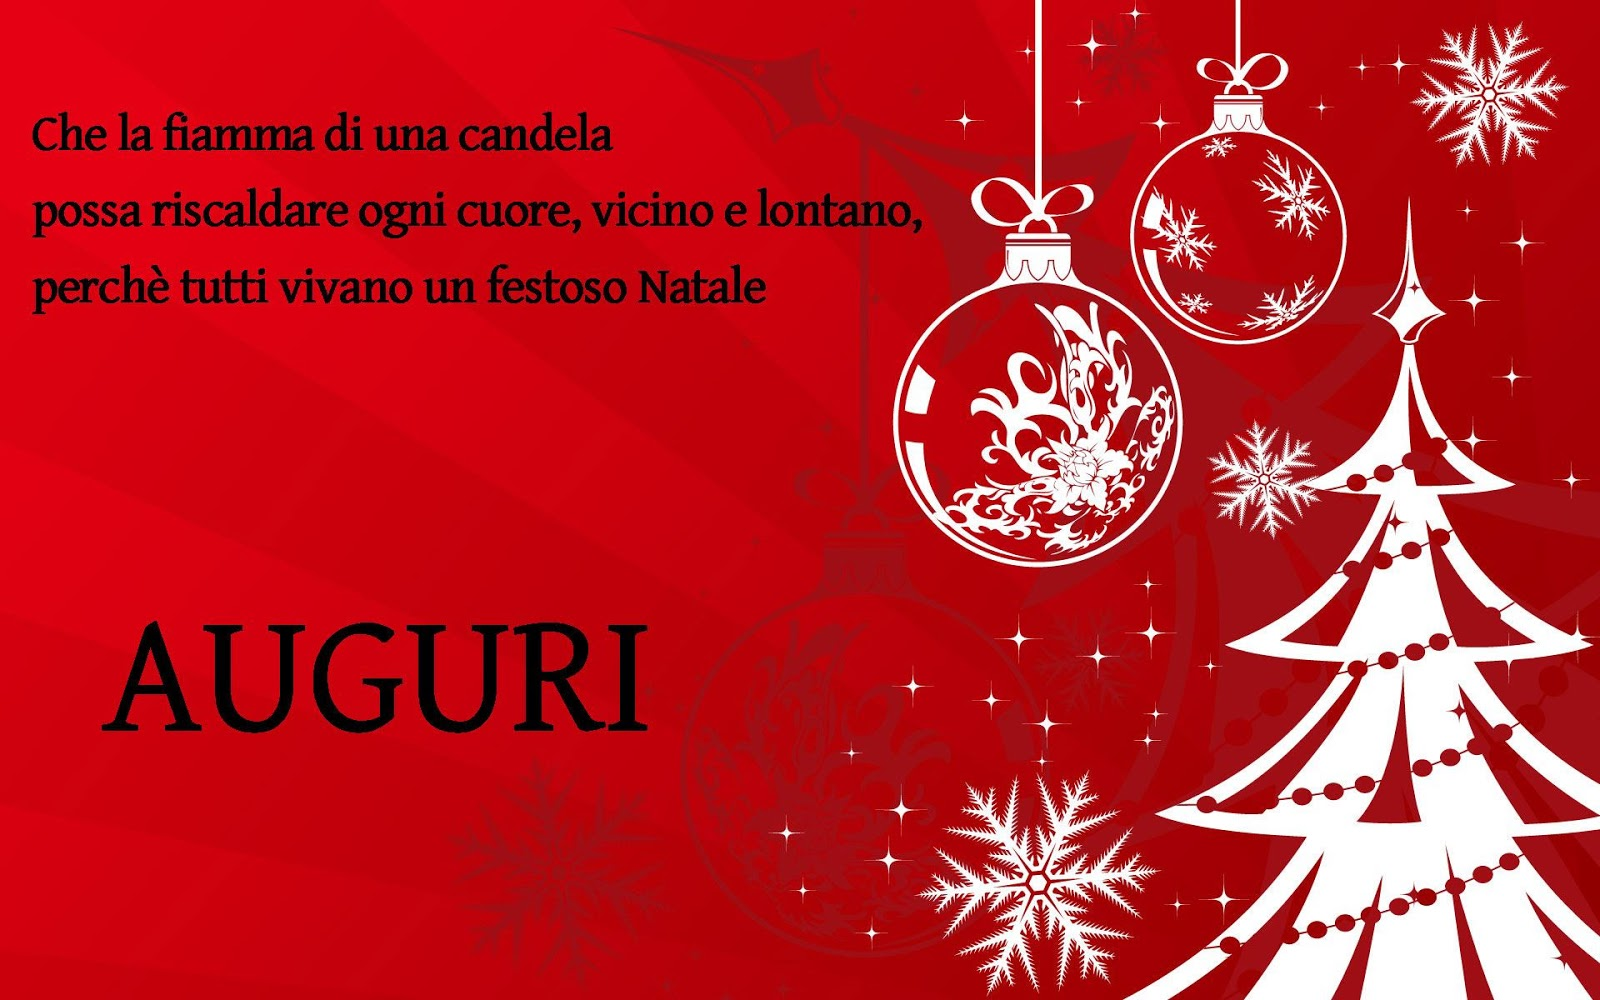 Auguri Di Natale Immagini Gratis.Foto Di Natale Per Whatsapp Logtrend